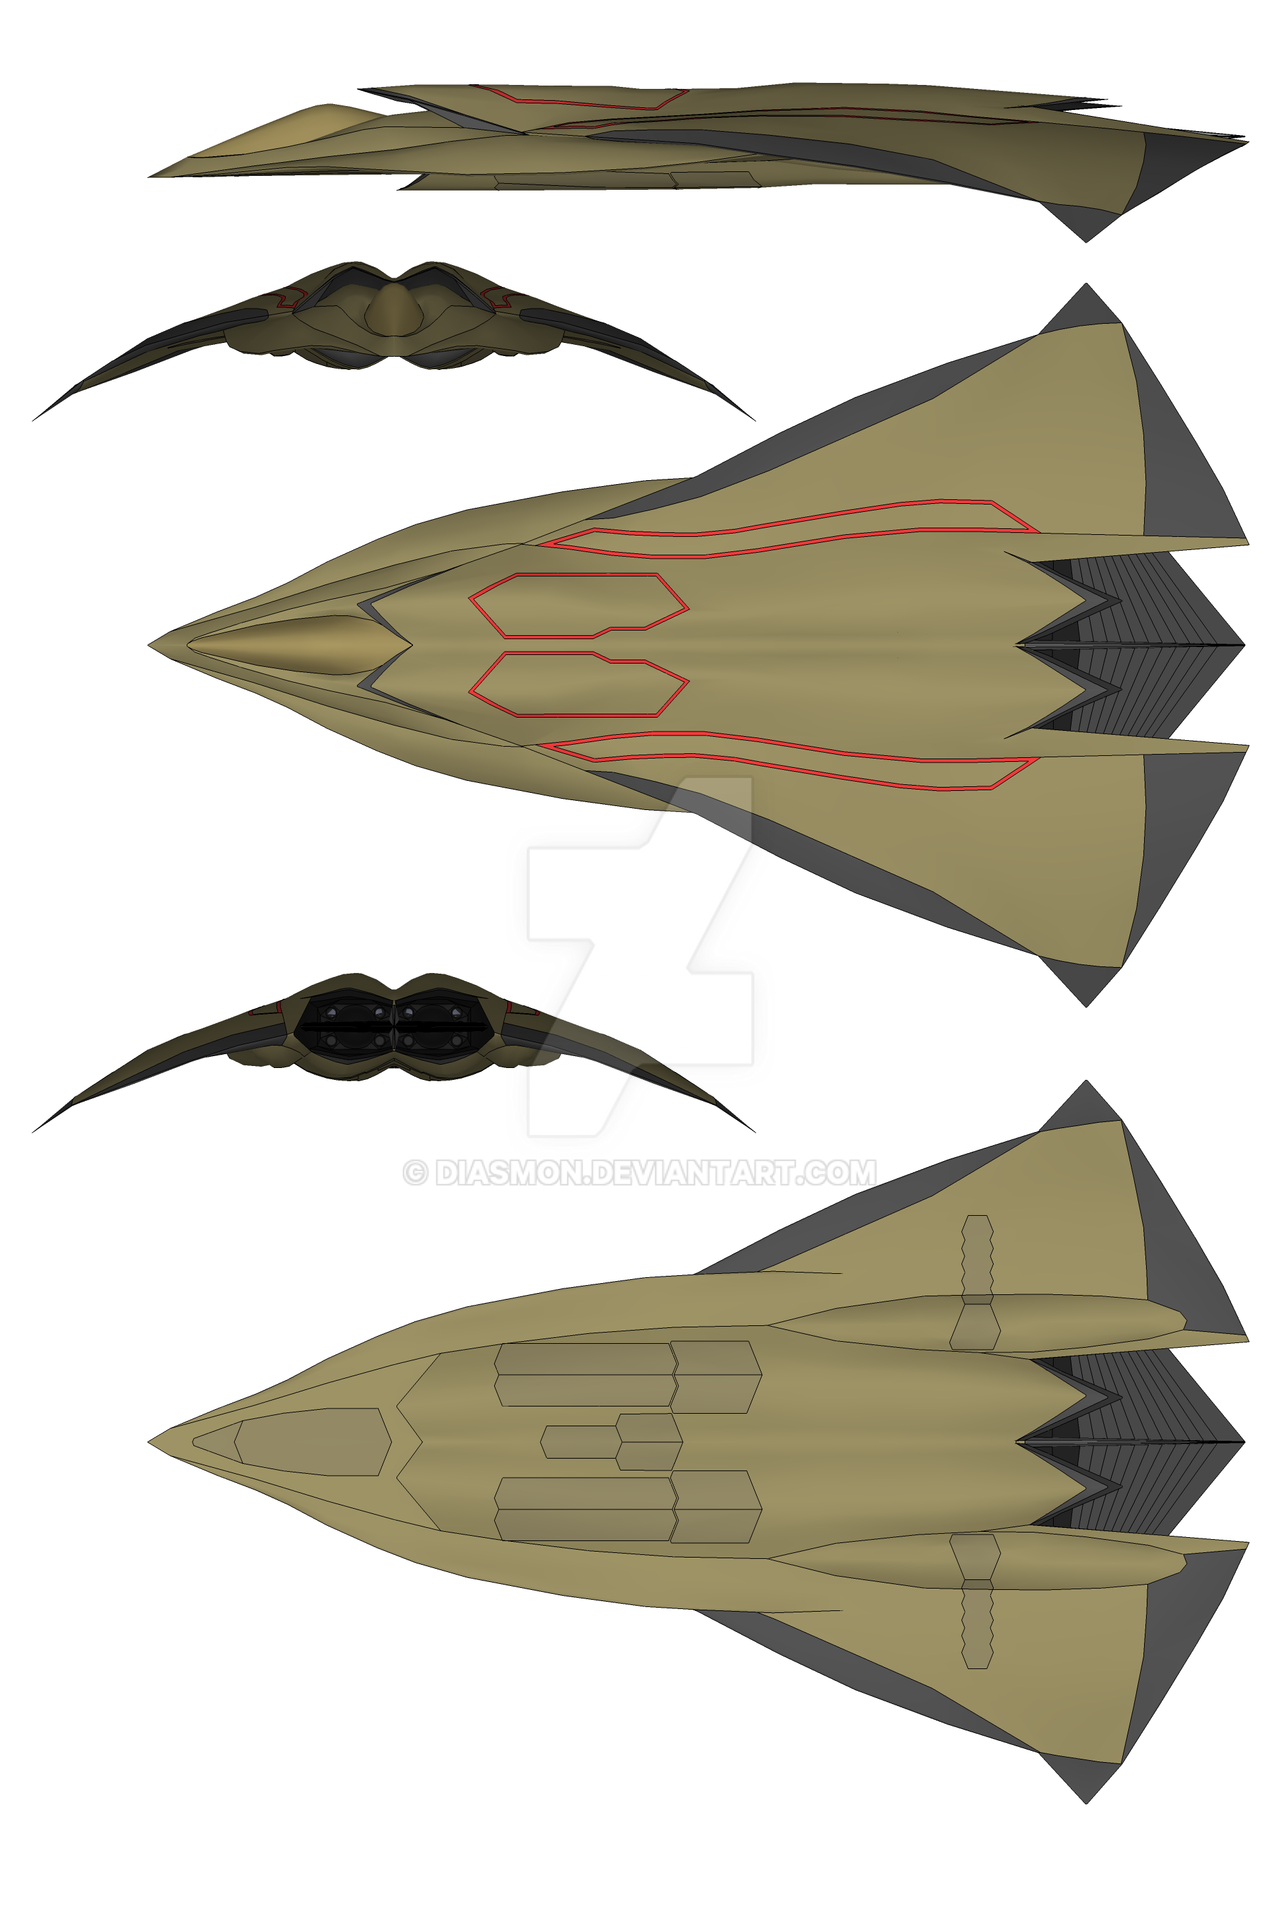 EDI schematics by diasmon